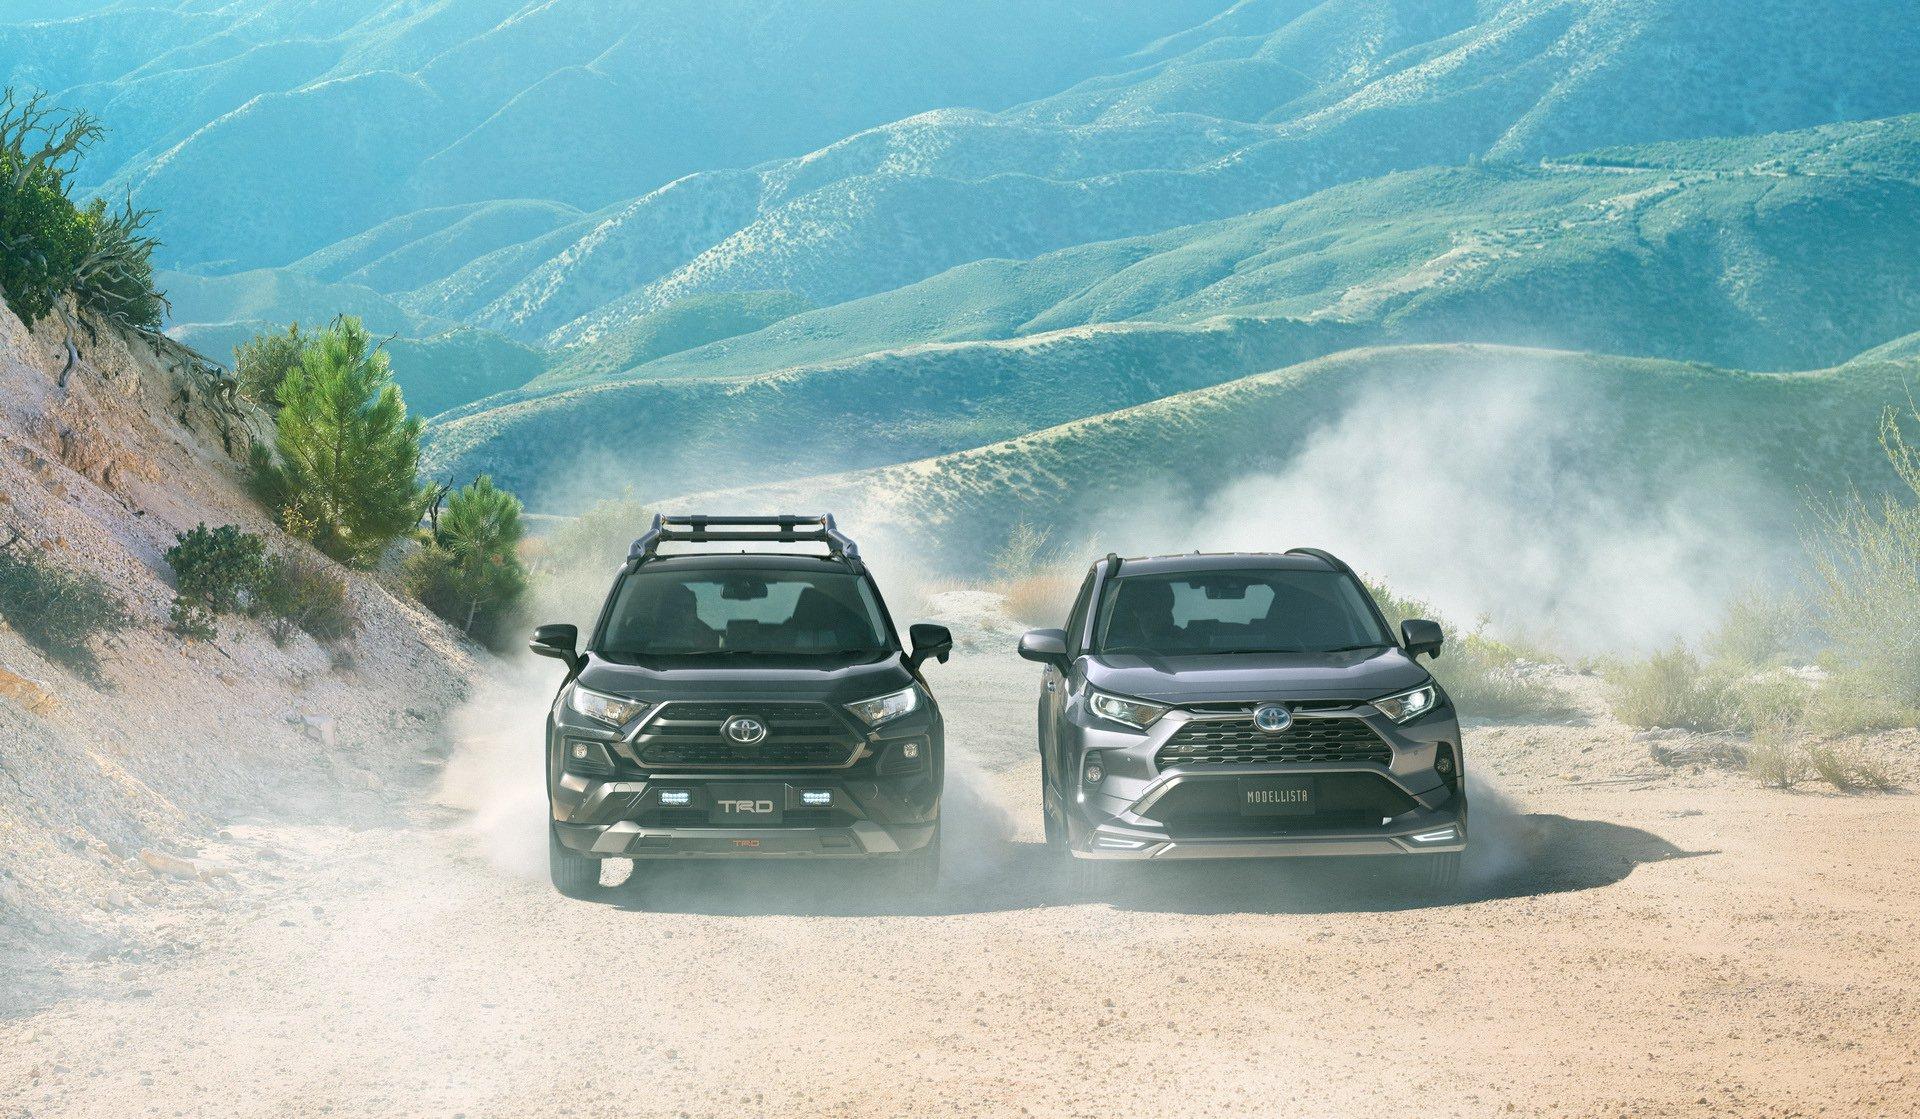 Toyota-RAV4-TRD-and-Modellista-3